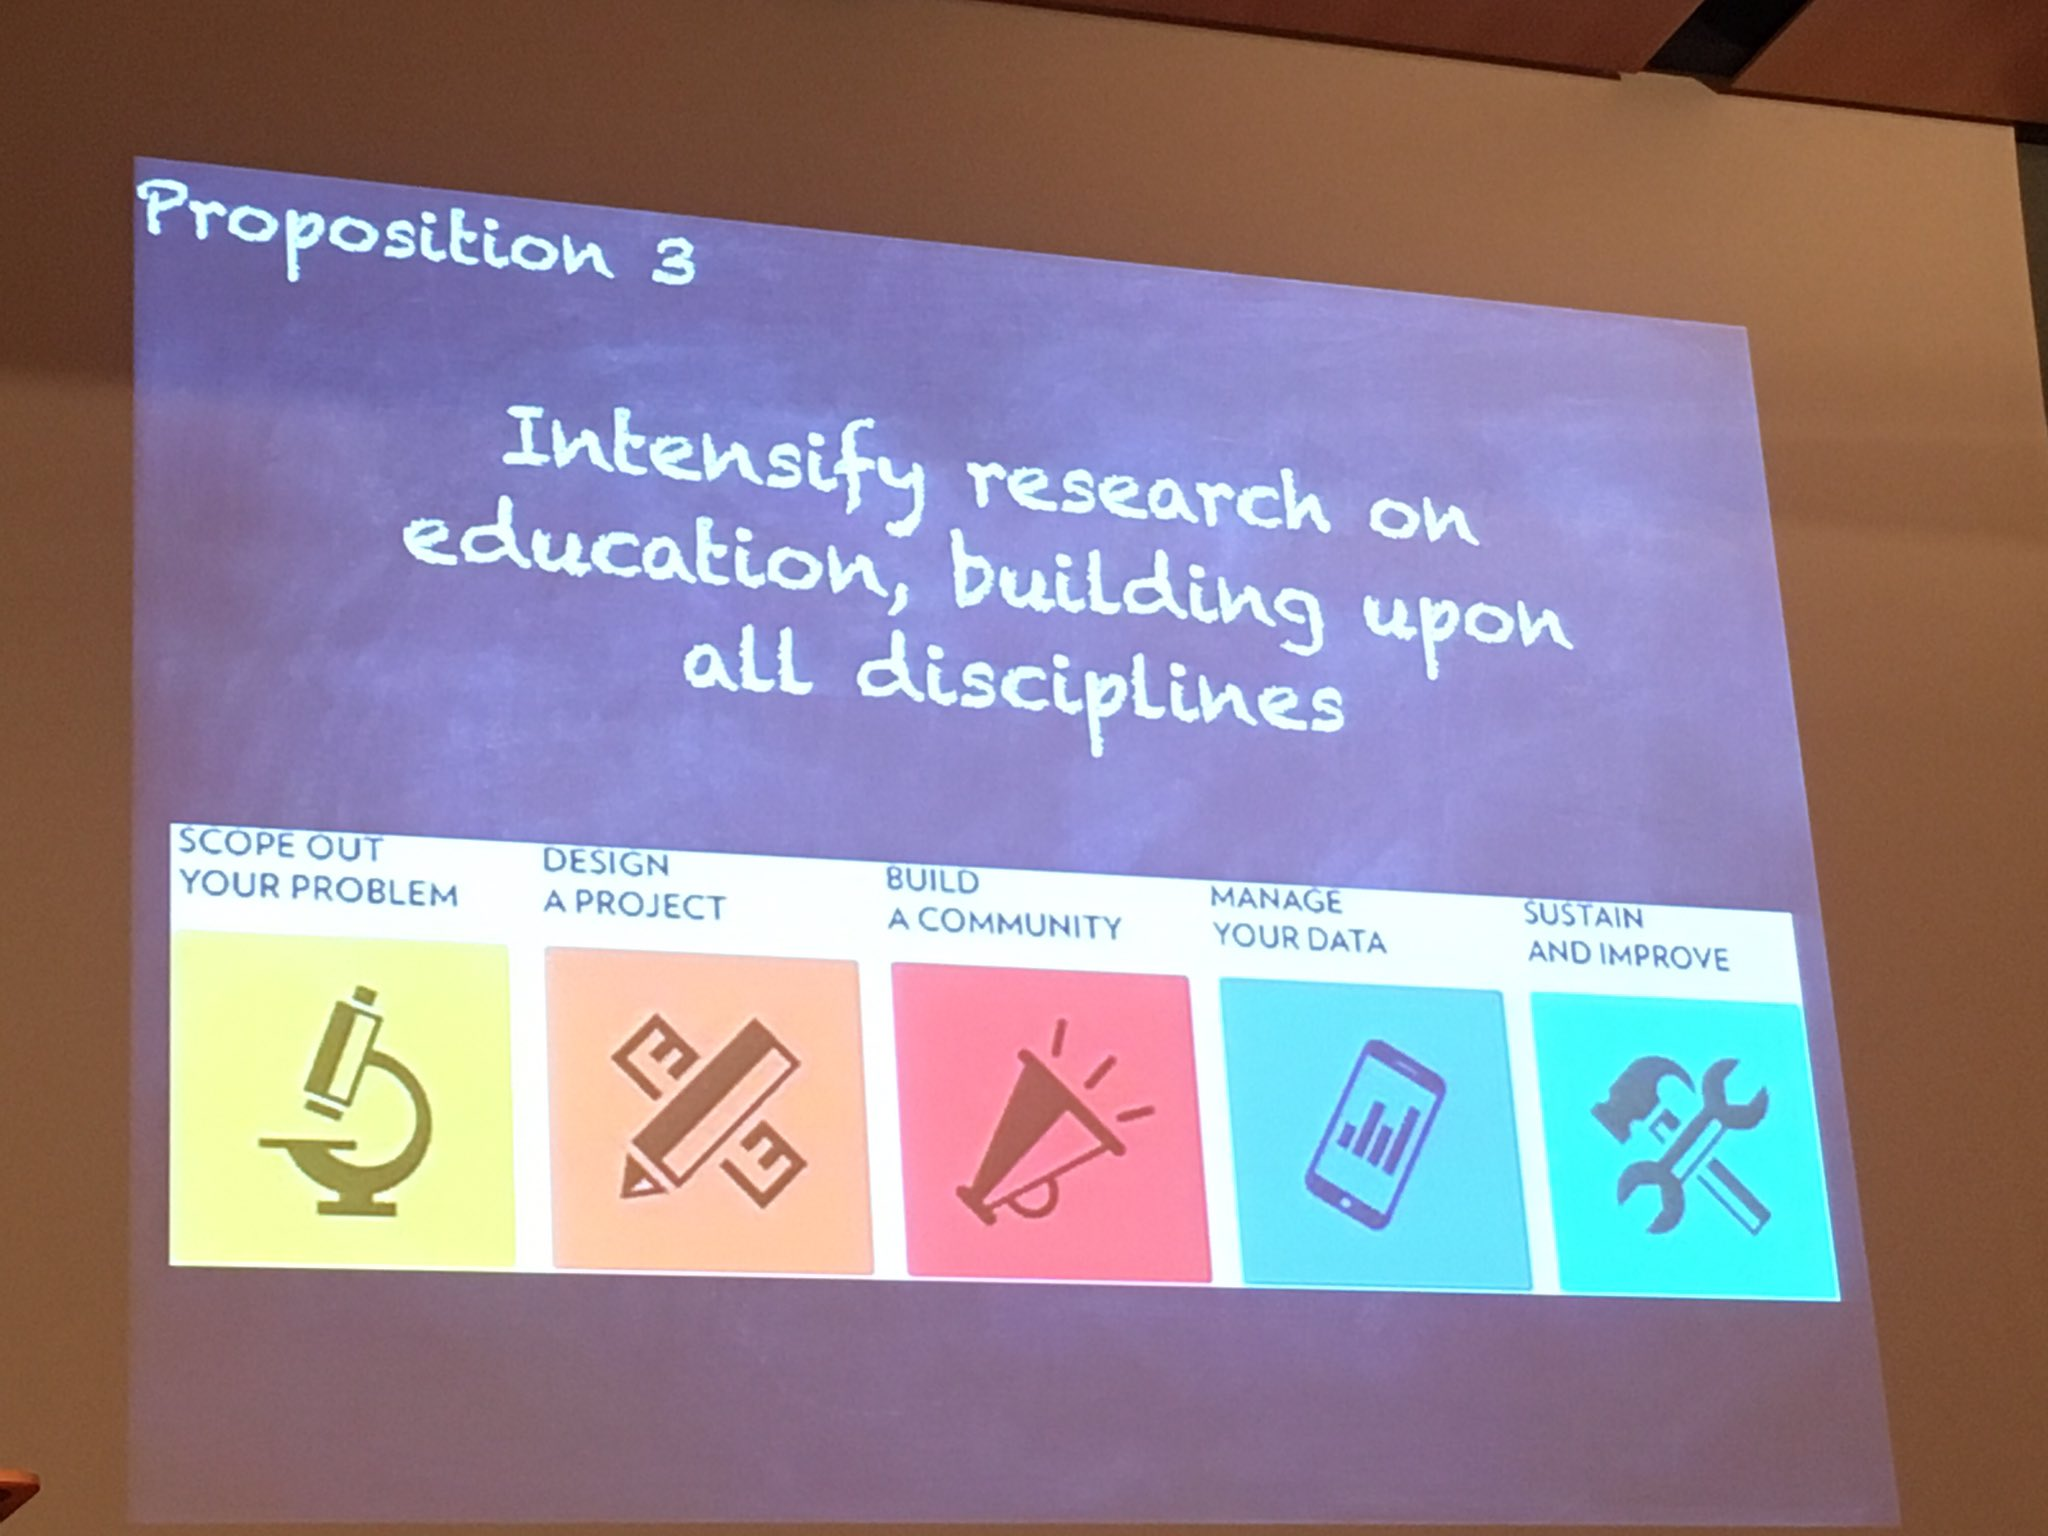 3. Développer la recherche en éducation #rndedu #eduinov https://t.co/aKUUBzWomX